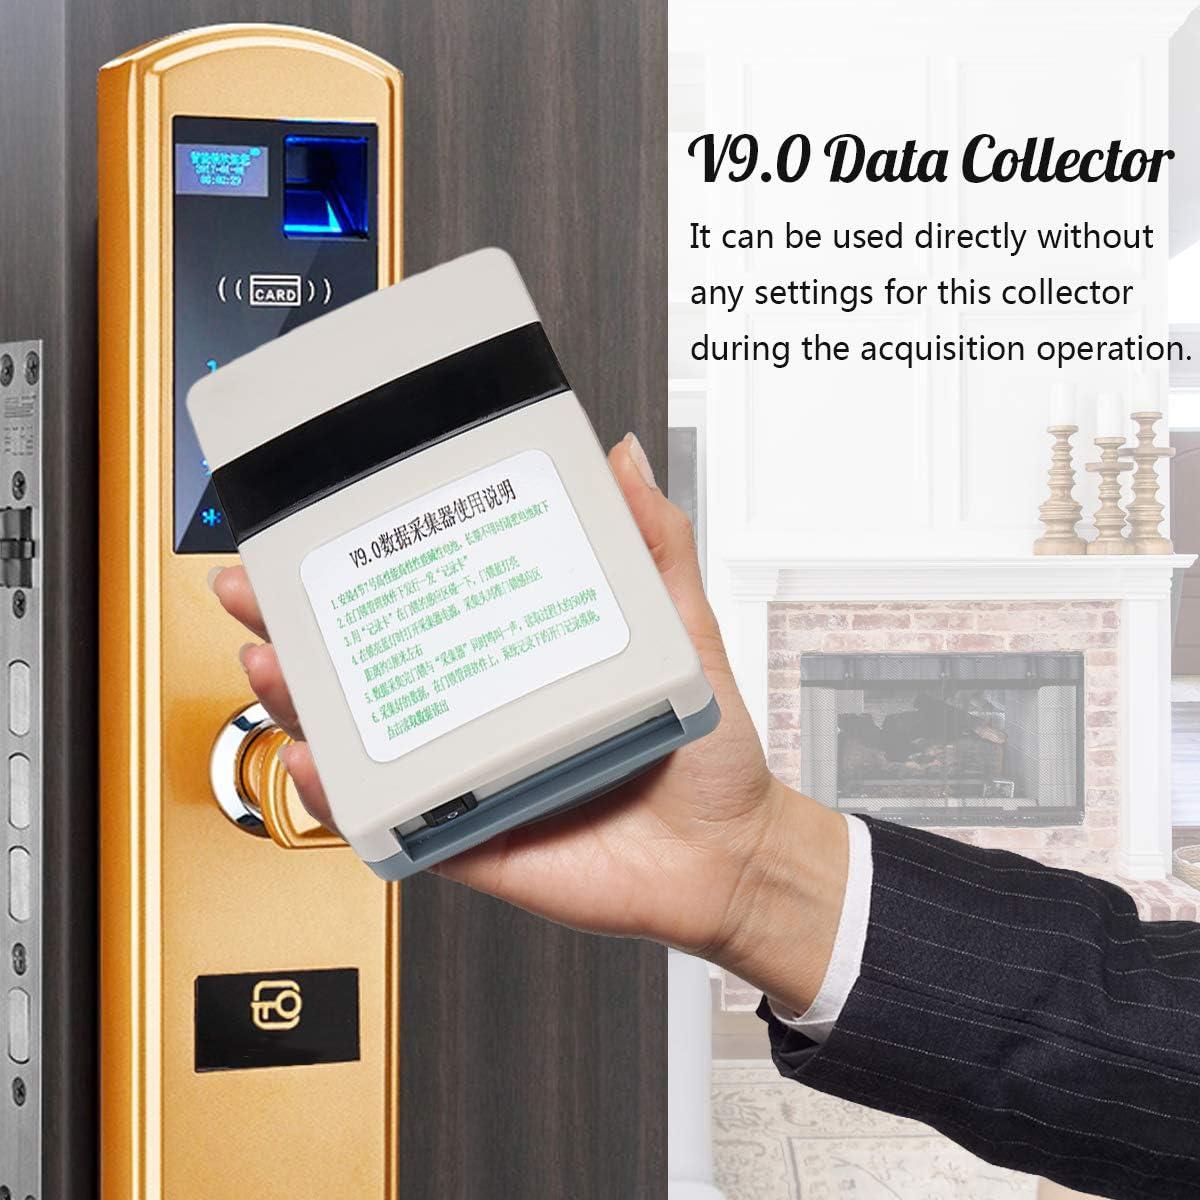 For T5557 Smart Card V9.0 Data Collector el Card Lock Managment System Reader Intelligent Setting Record USB Identification JohnnyBui